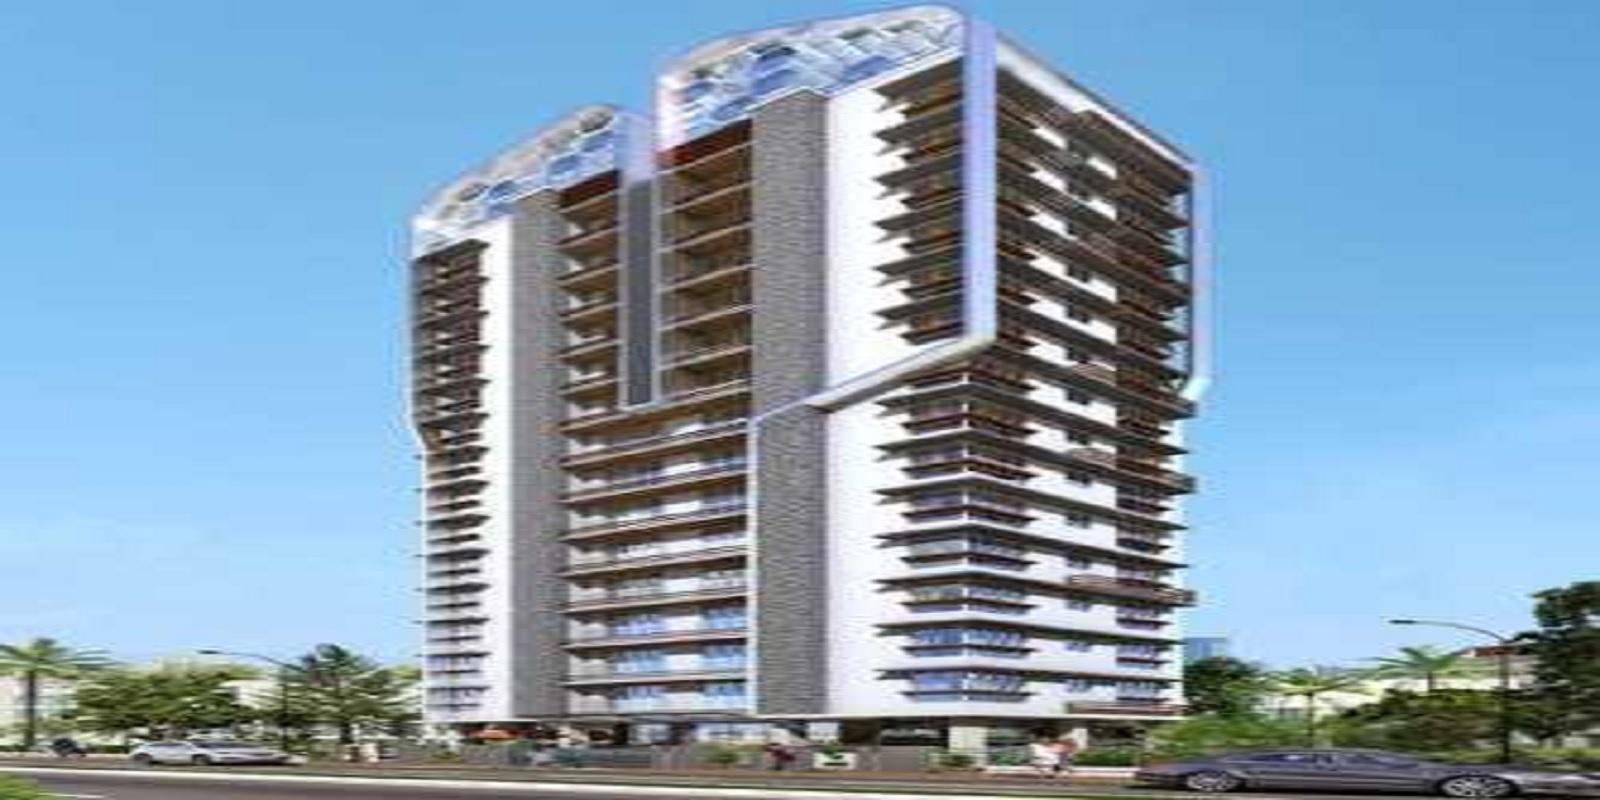 kamla prathamesh residency project project large image1